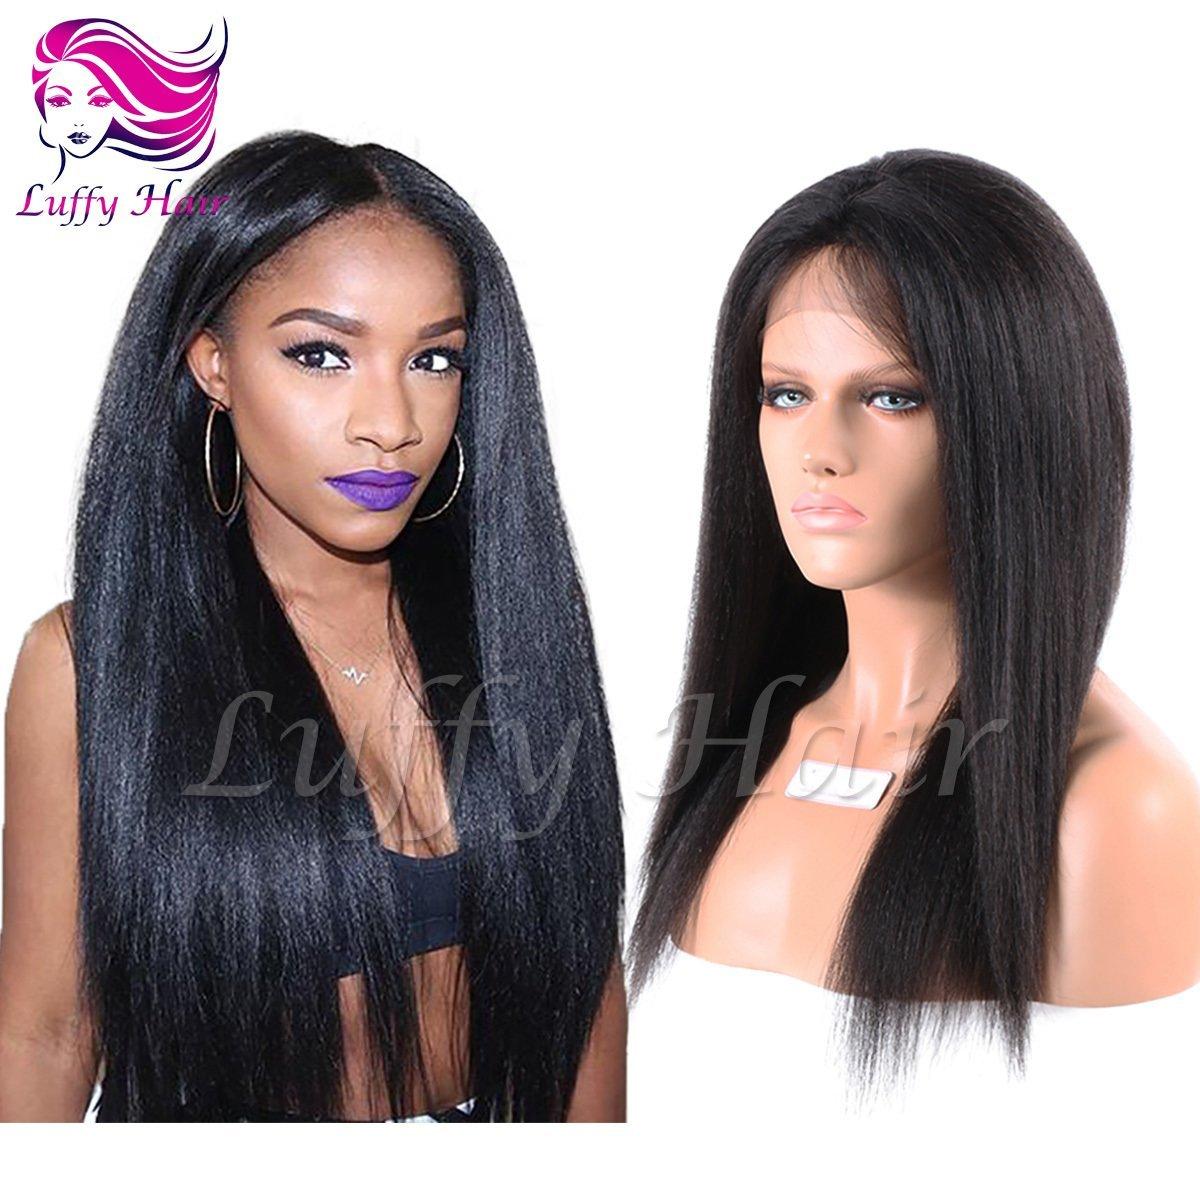 8A Virgin Human Hair Italian Yaki Straight Wig - KWL028